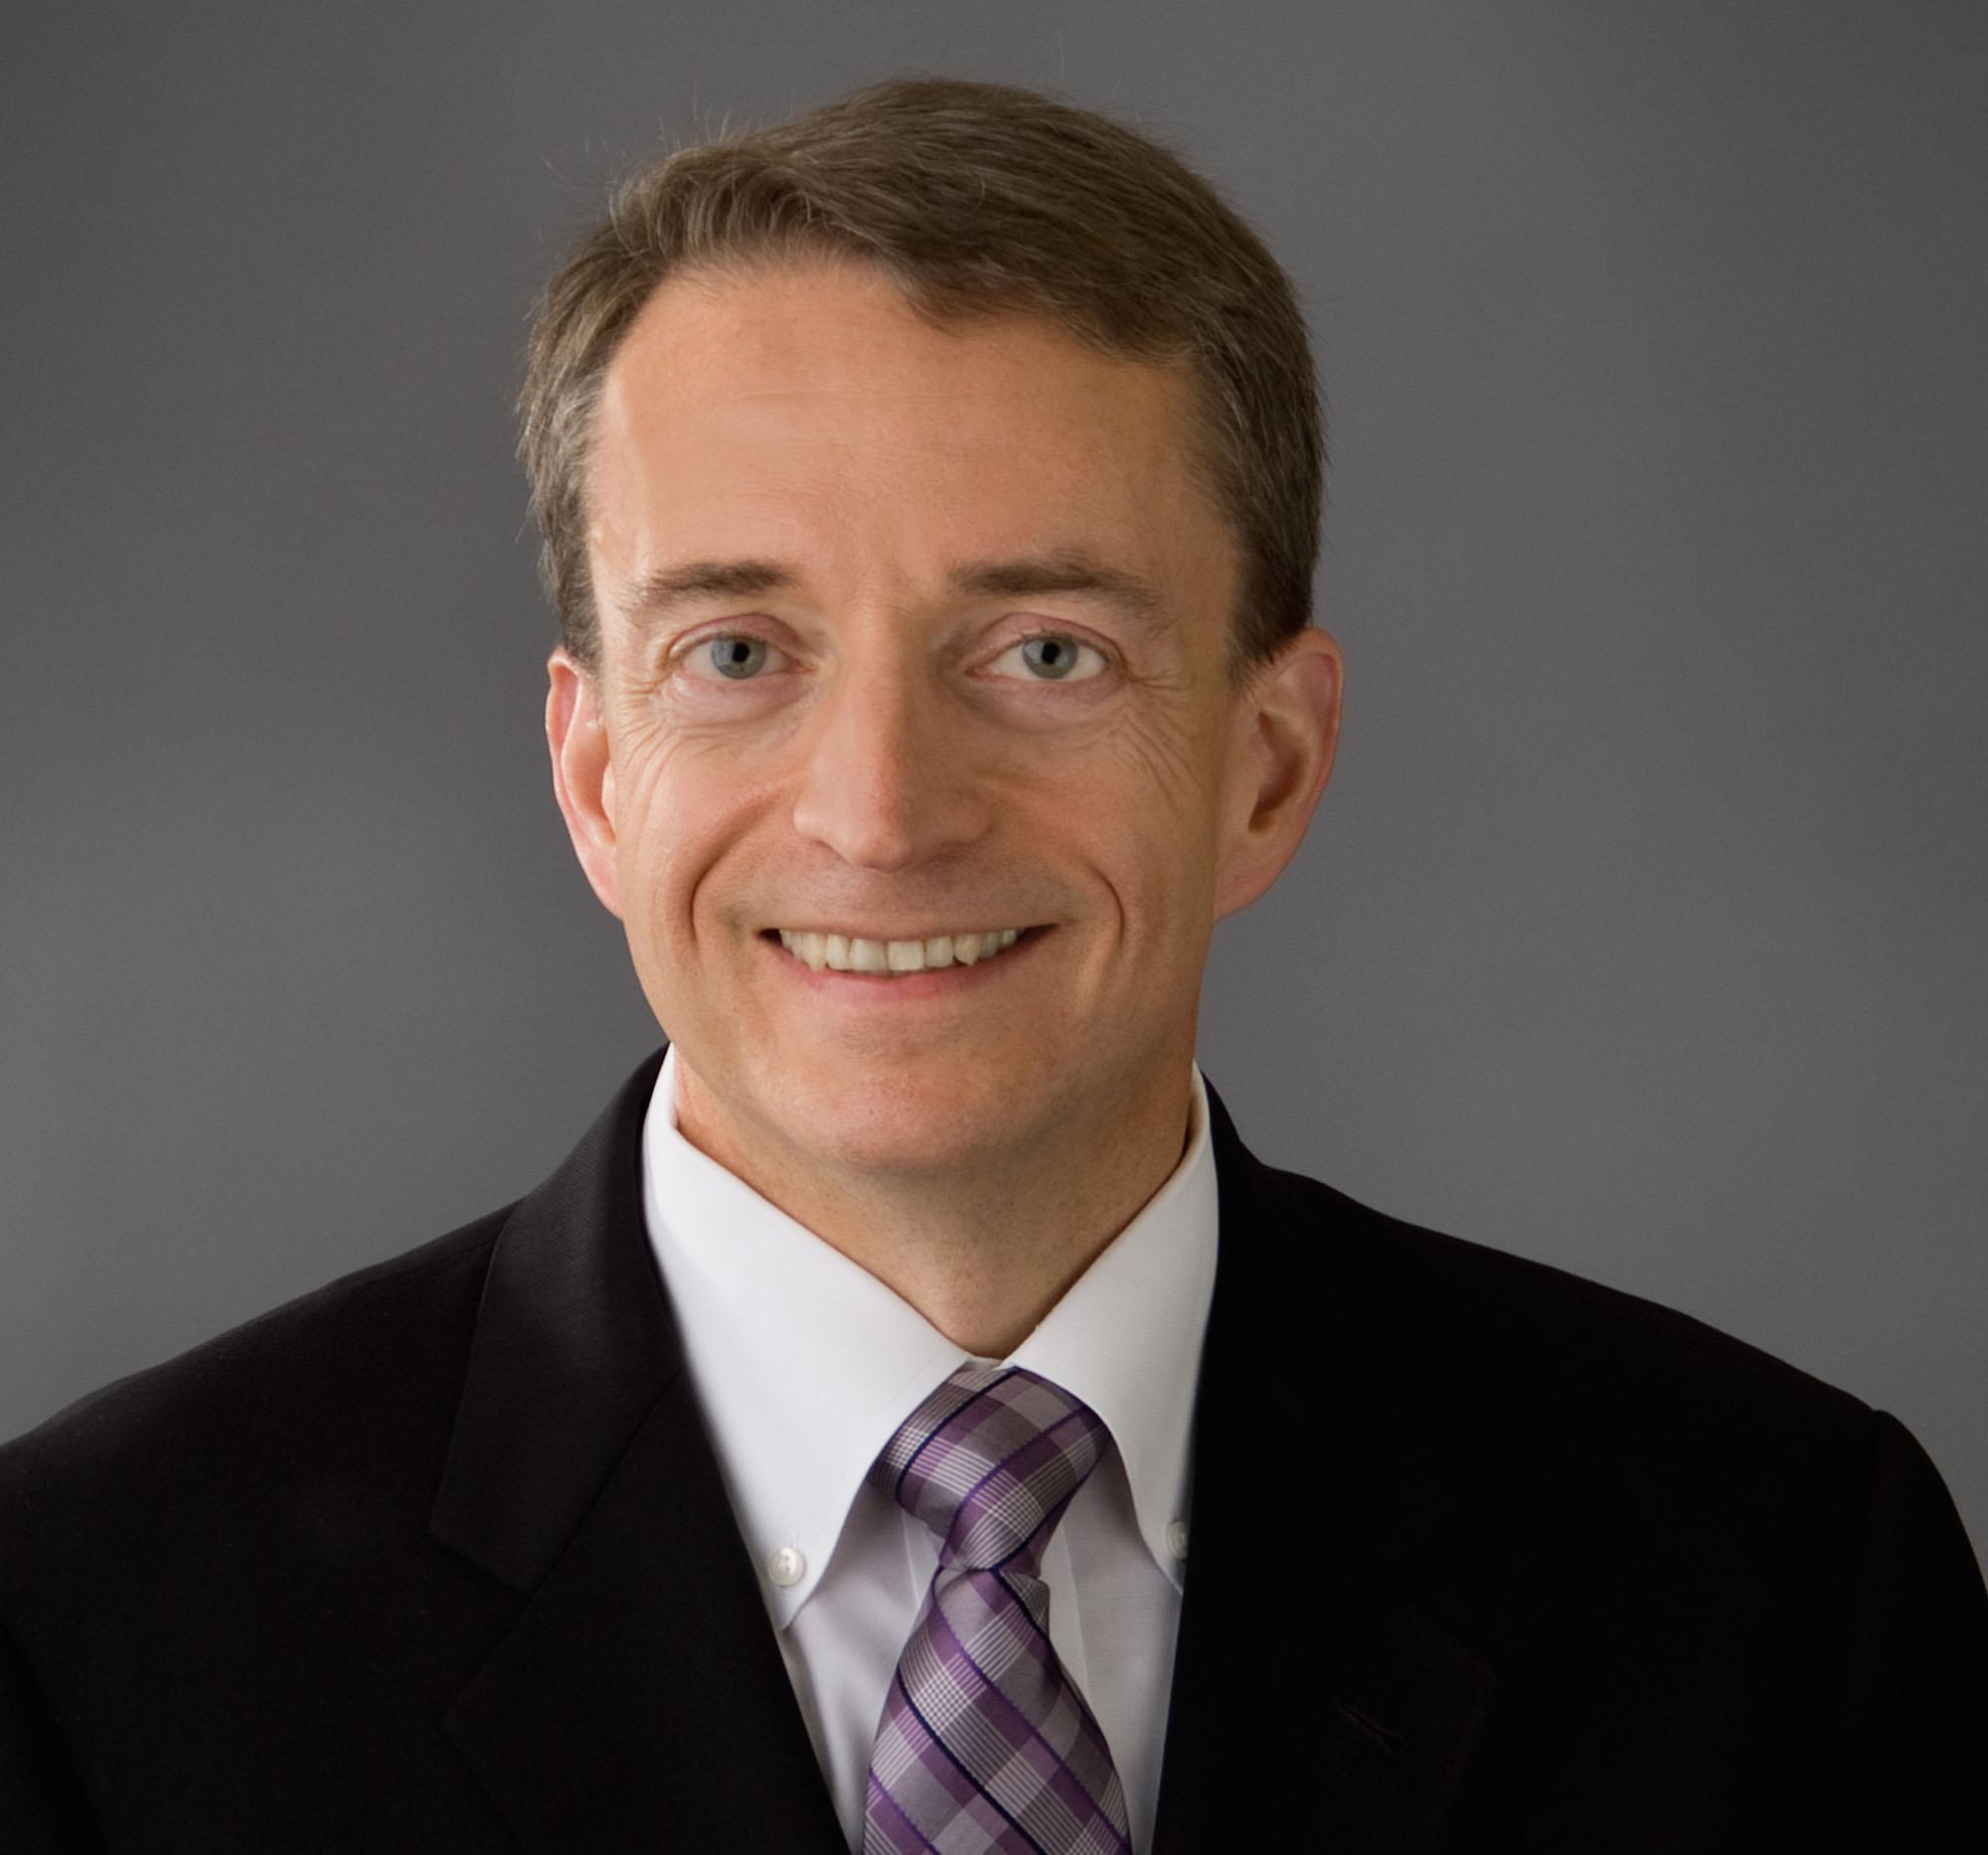 Pat Gelsinger, CEO, VMware - HR-2